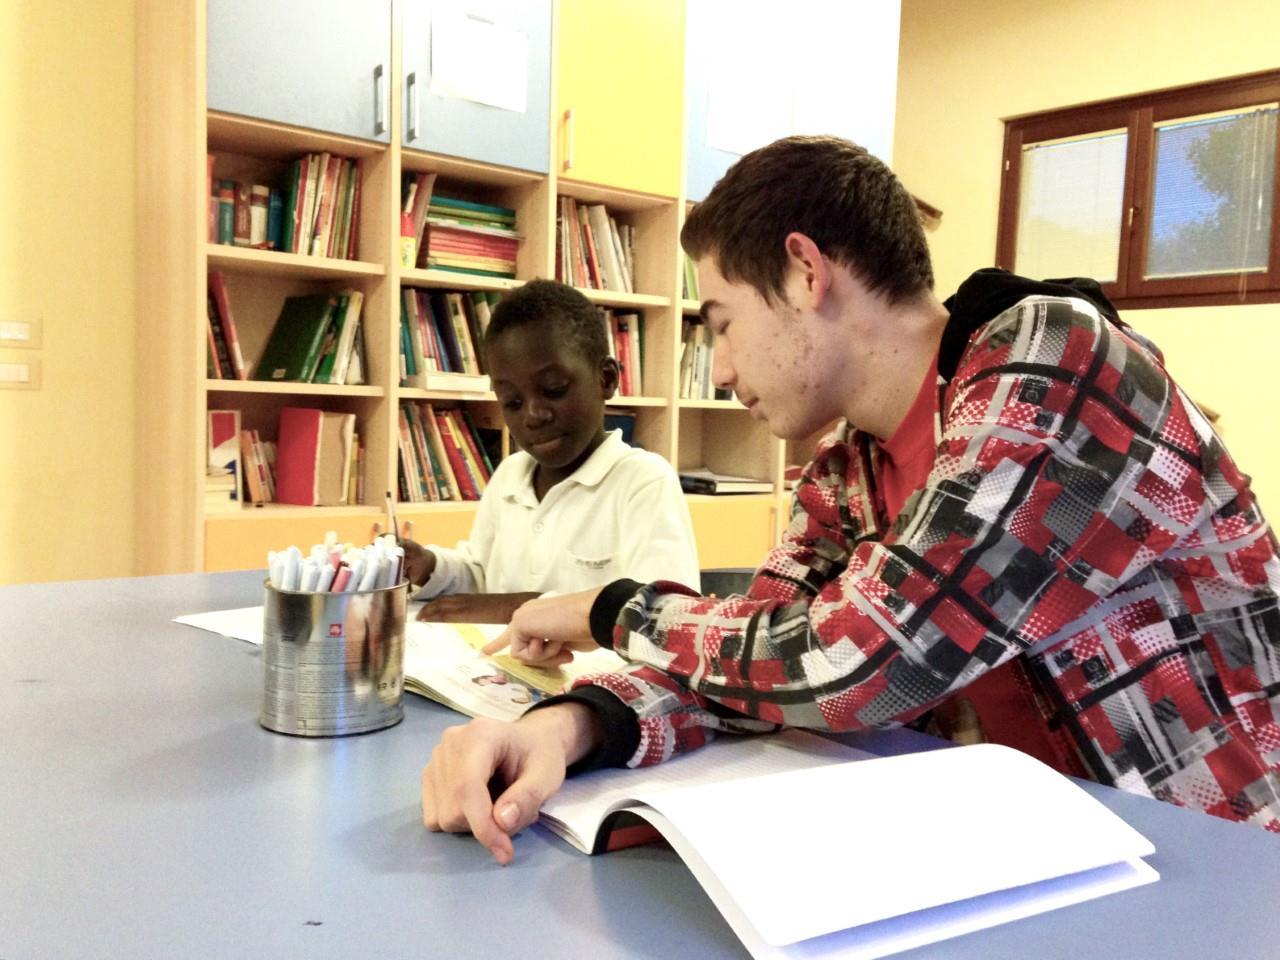 Laboratorio di peer education